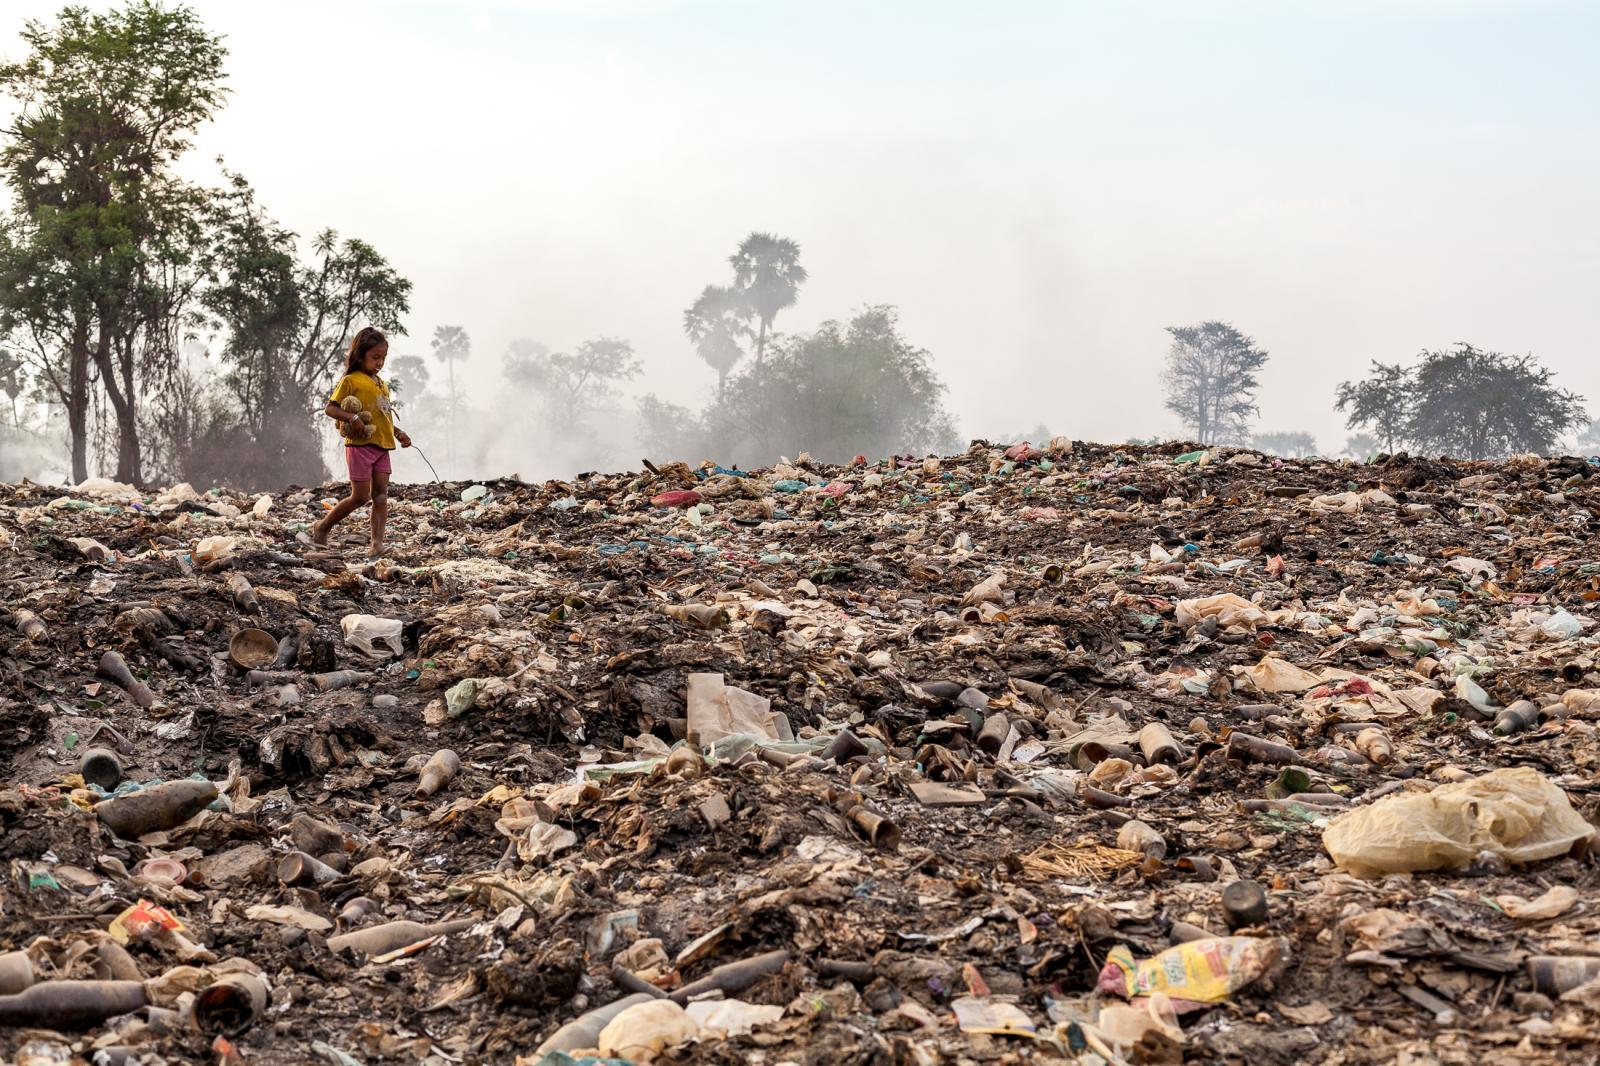 Photography image - Loading 002_Rubbish_Cambodia.jpg